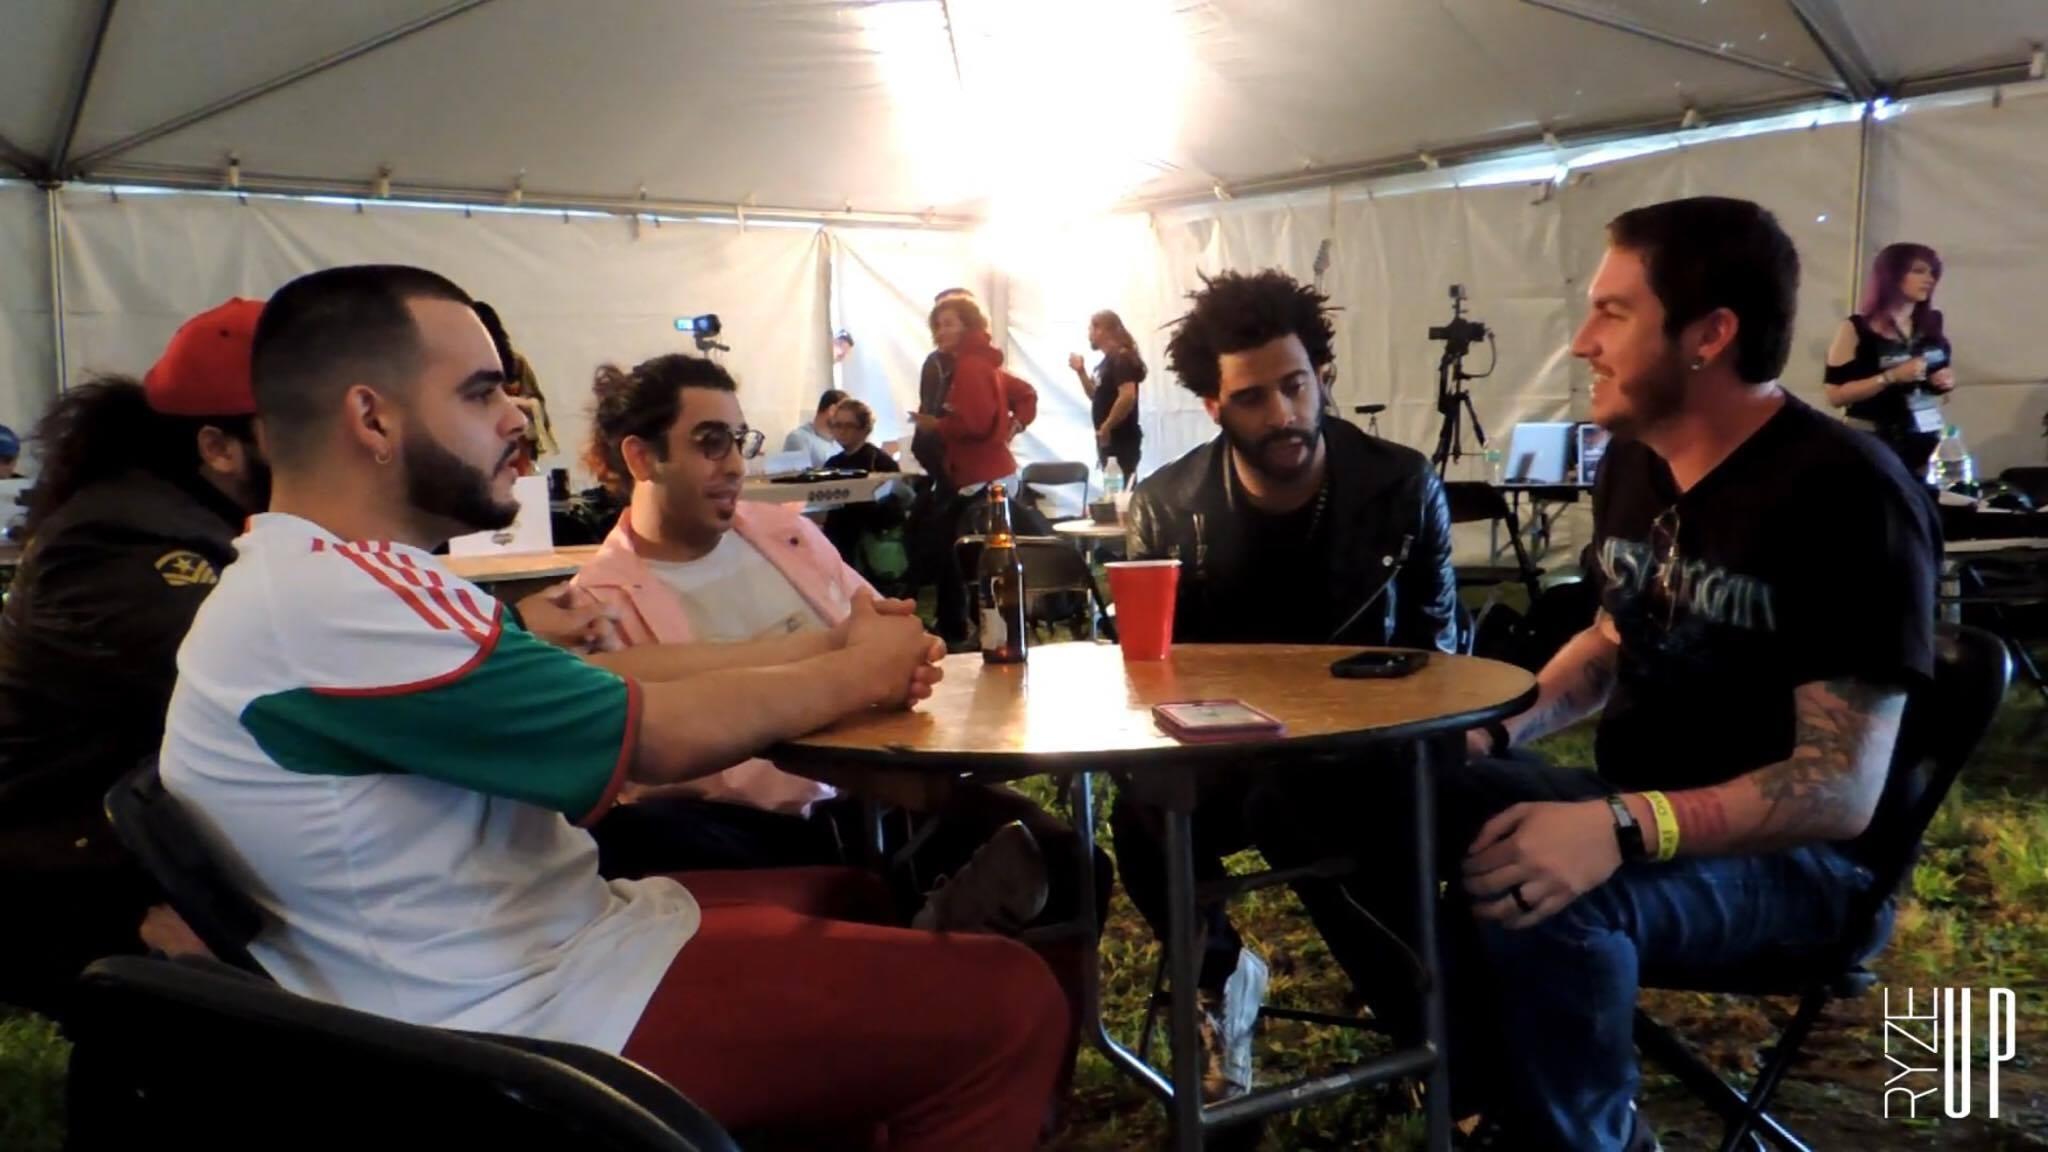 VOLUMES Talks With Ryze-Up at CAROLINA REBELLION 2017 | Backstage Conversations | Ryze-Up TV